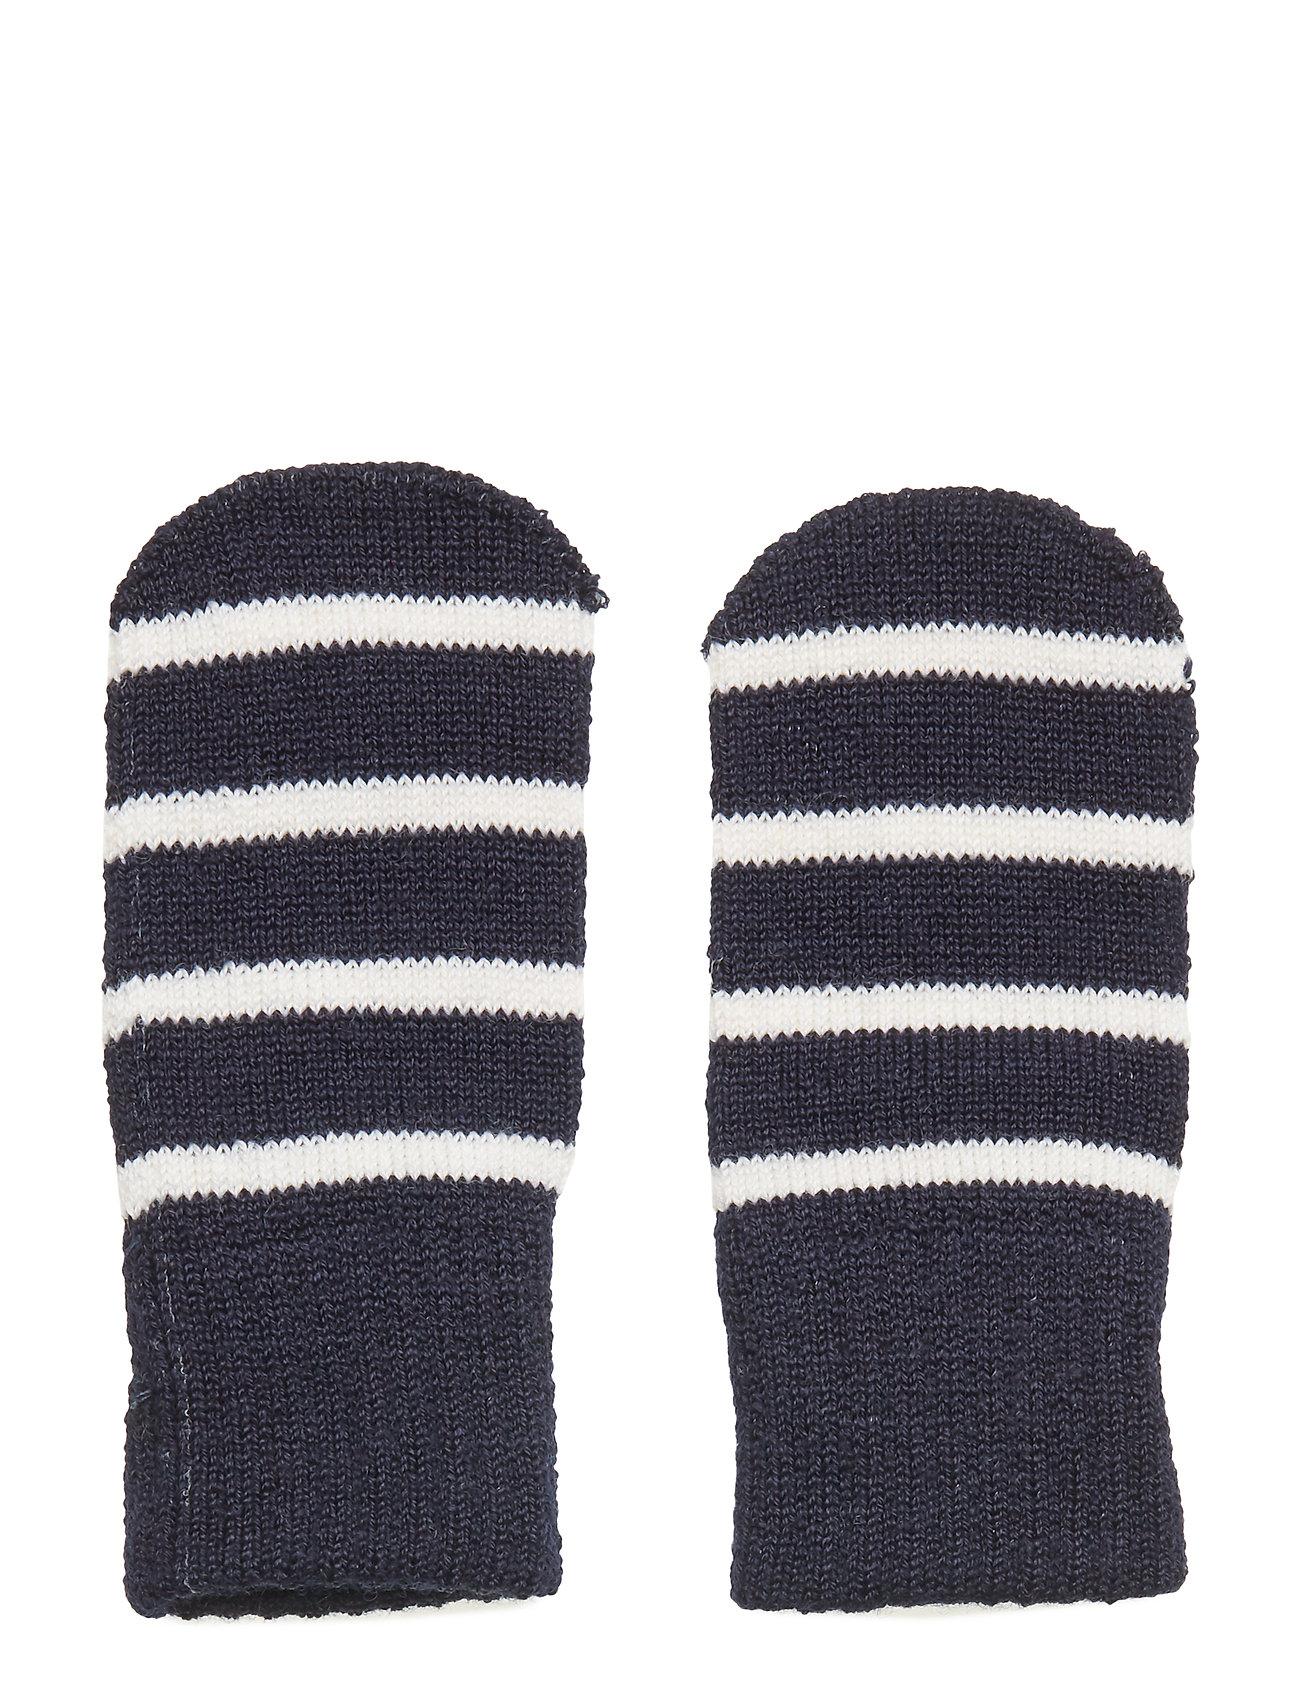 Polarn O. Pyret Striped Wool Thumbless Magic Mittens